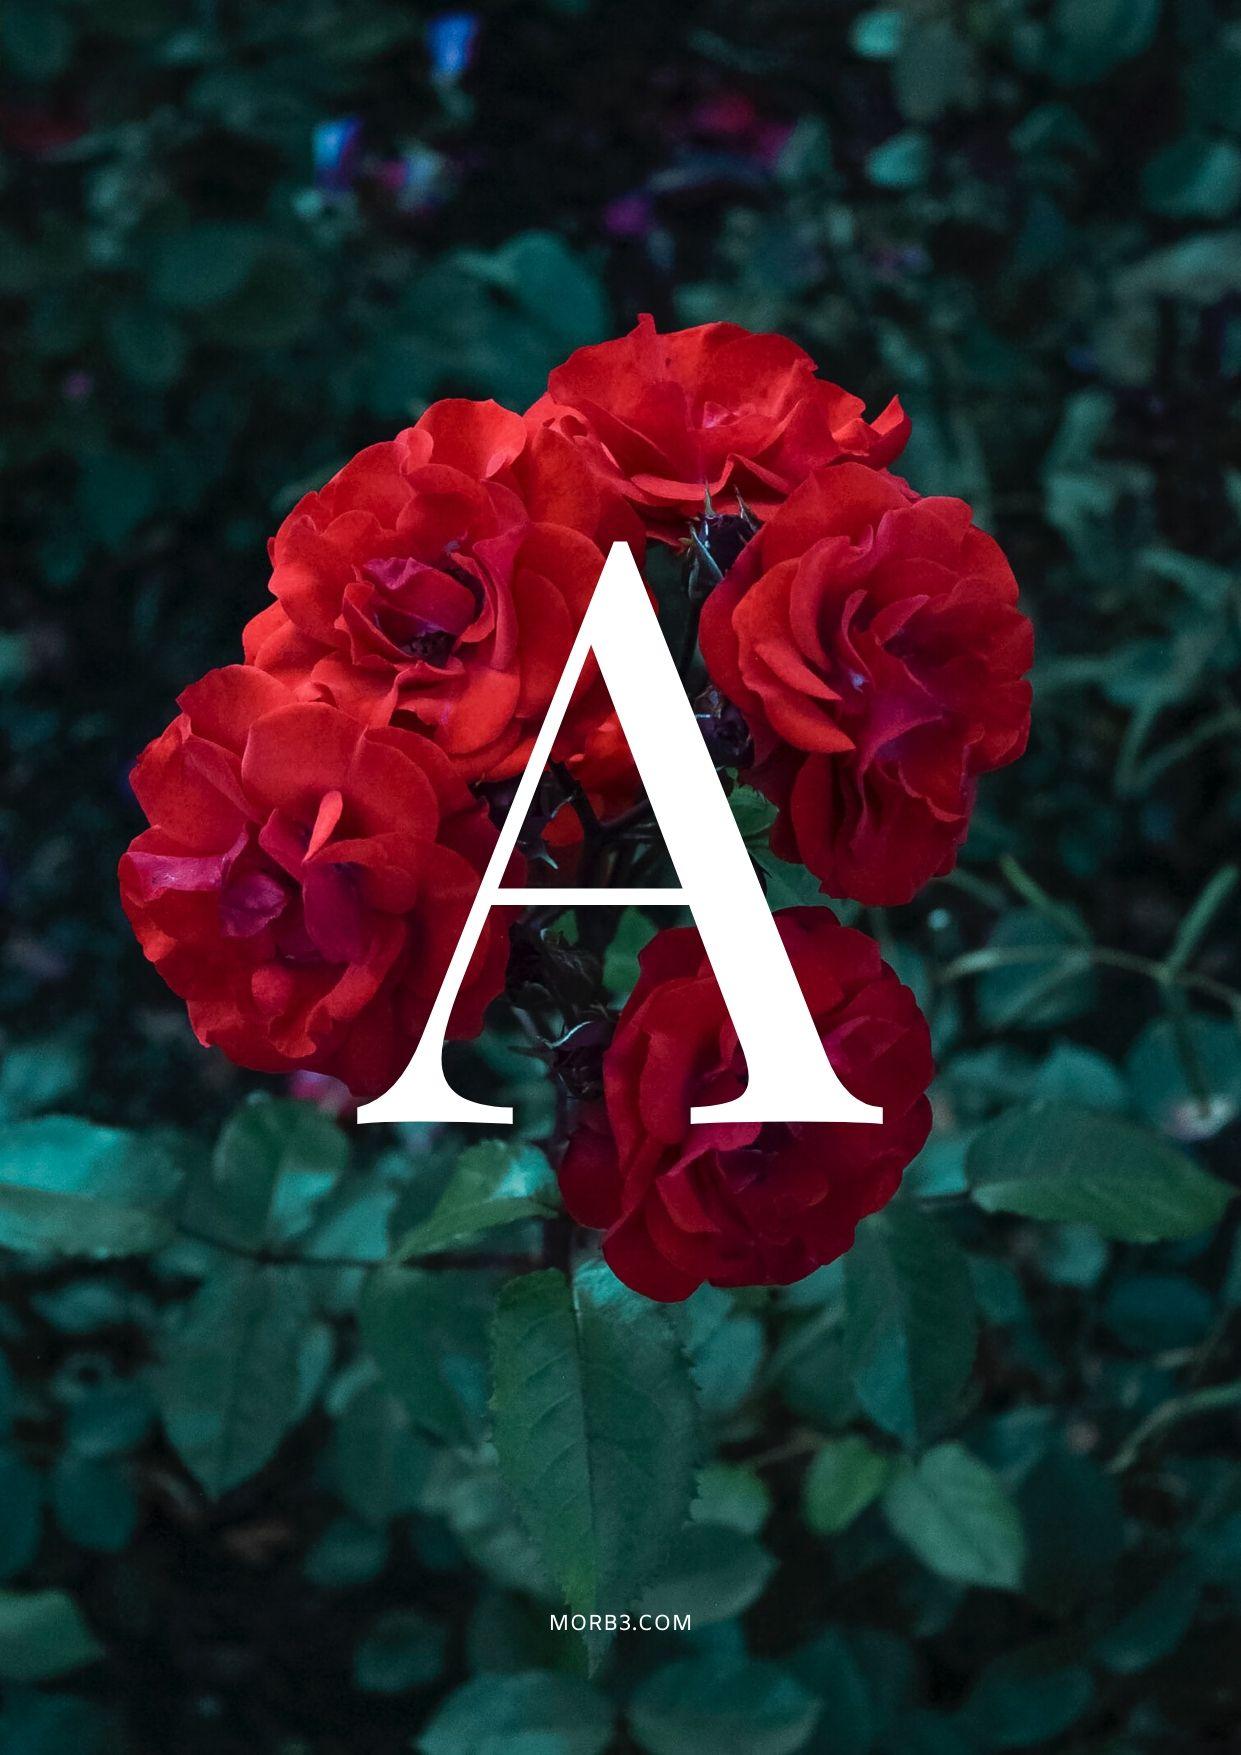 صور حرف A خلفيات حرف A خلفيات حرف A رومانسية اجمل حرف A في العالم حرف A بالورد حرف A احبك حرف A في قلوب حرف A مع كلام حب خلفيات حرف